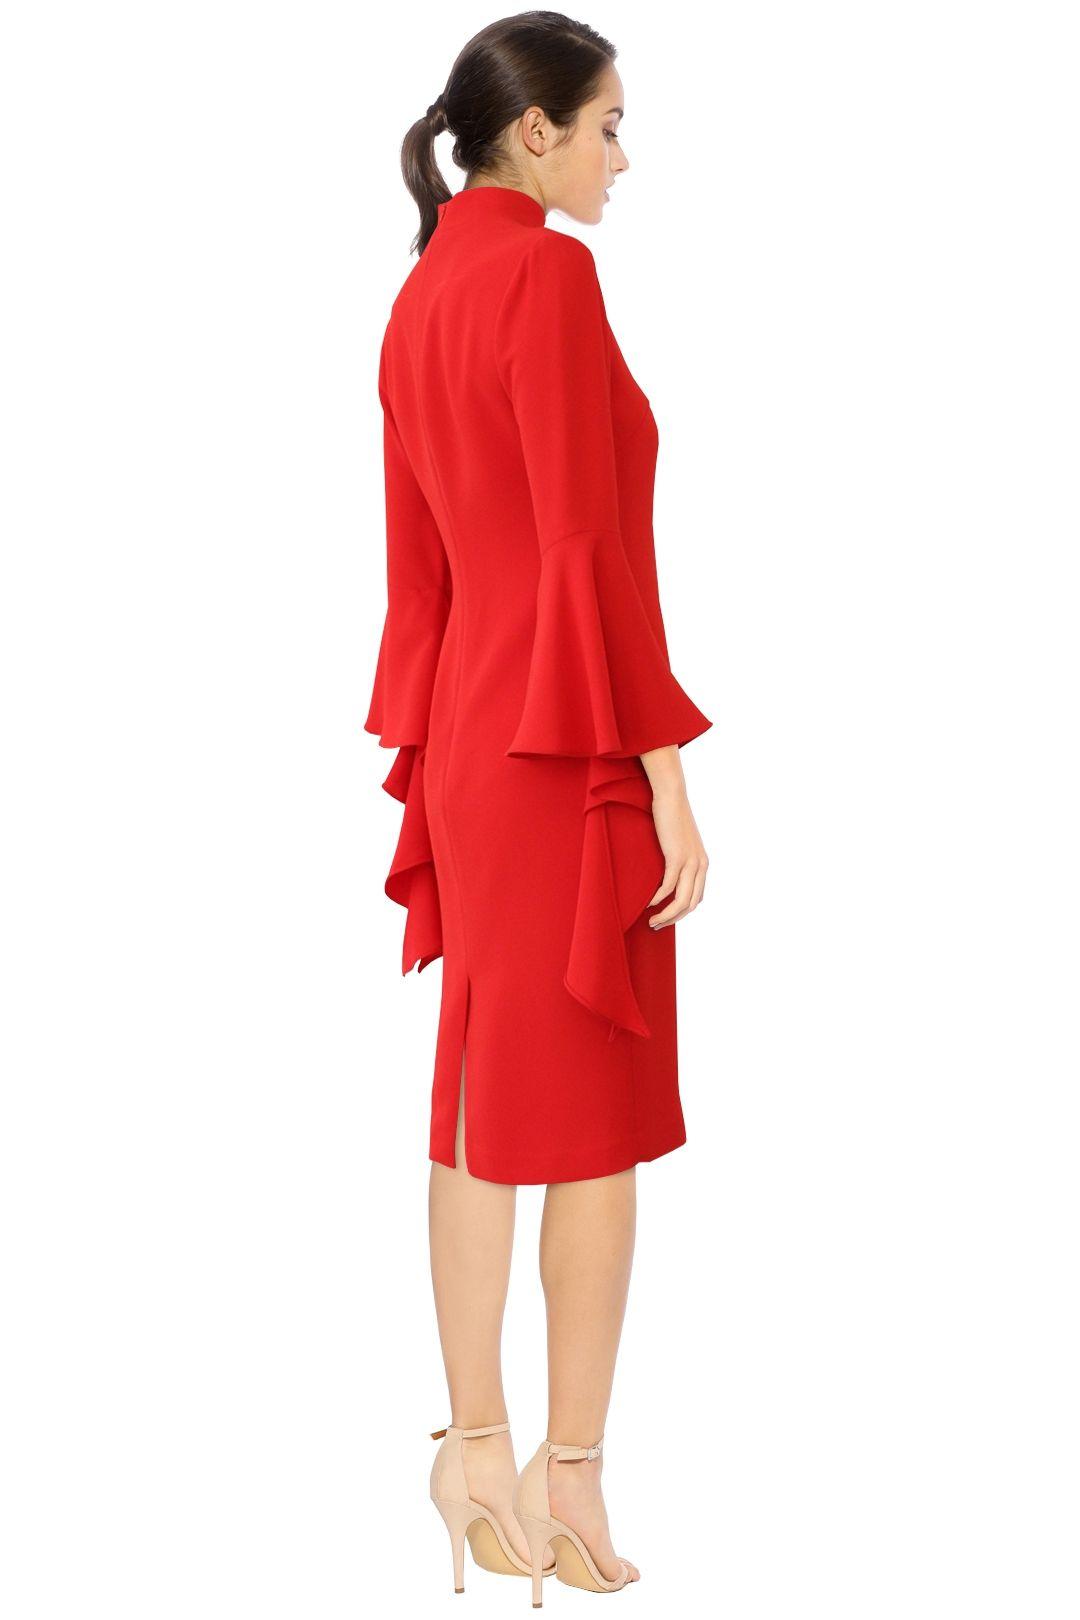 Carla Zampatti - Senorina Dress - Red - Back